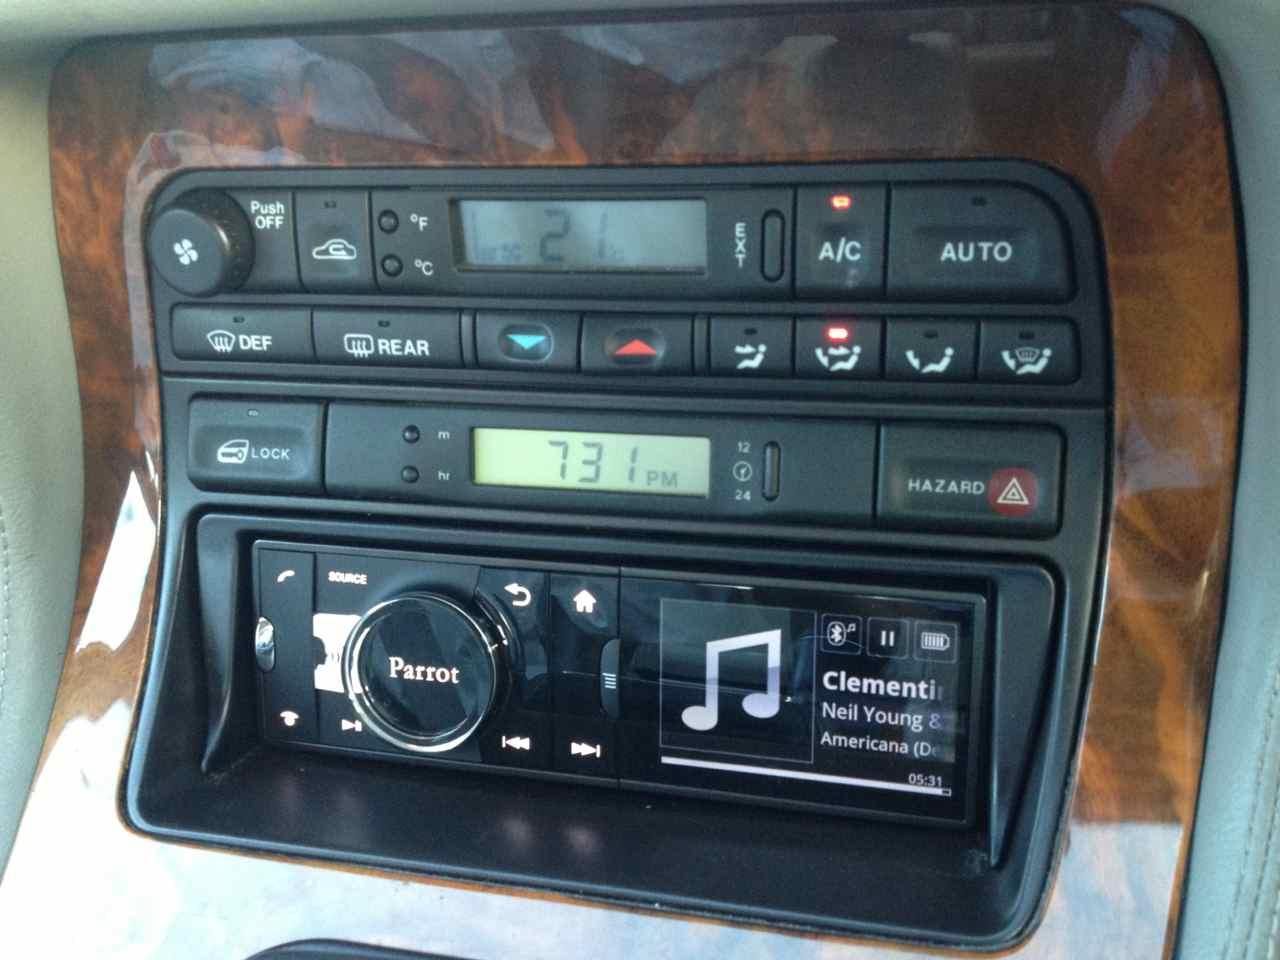 Jaguar Xjs Radio Wiring Diagram – Jaguar Xjs Fuel Pump Wiring Diagram